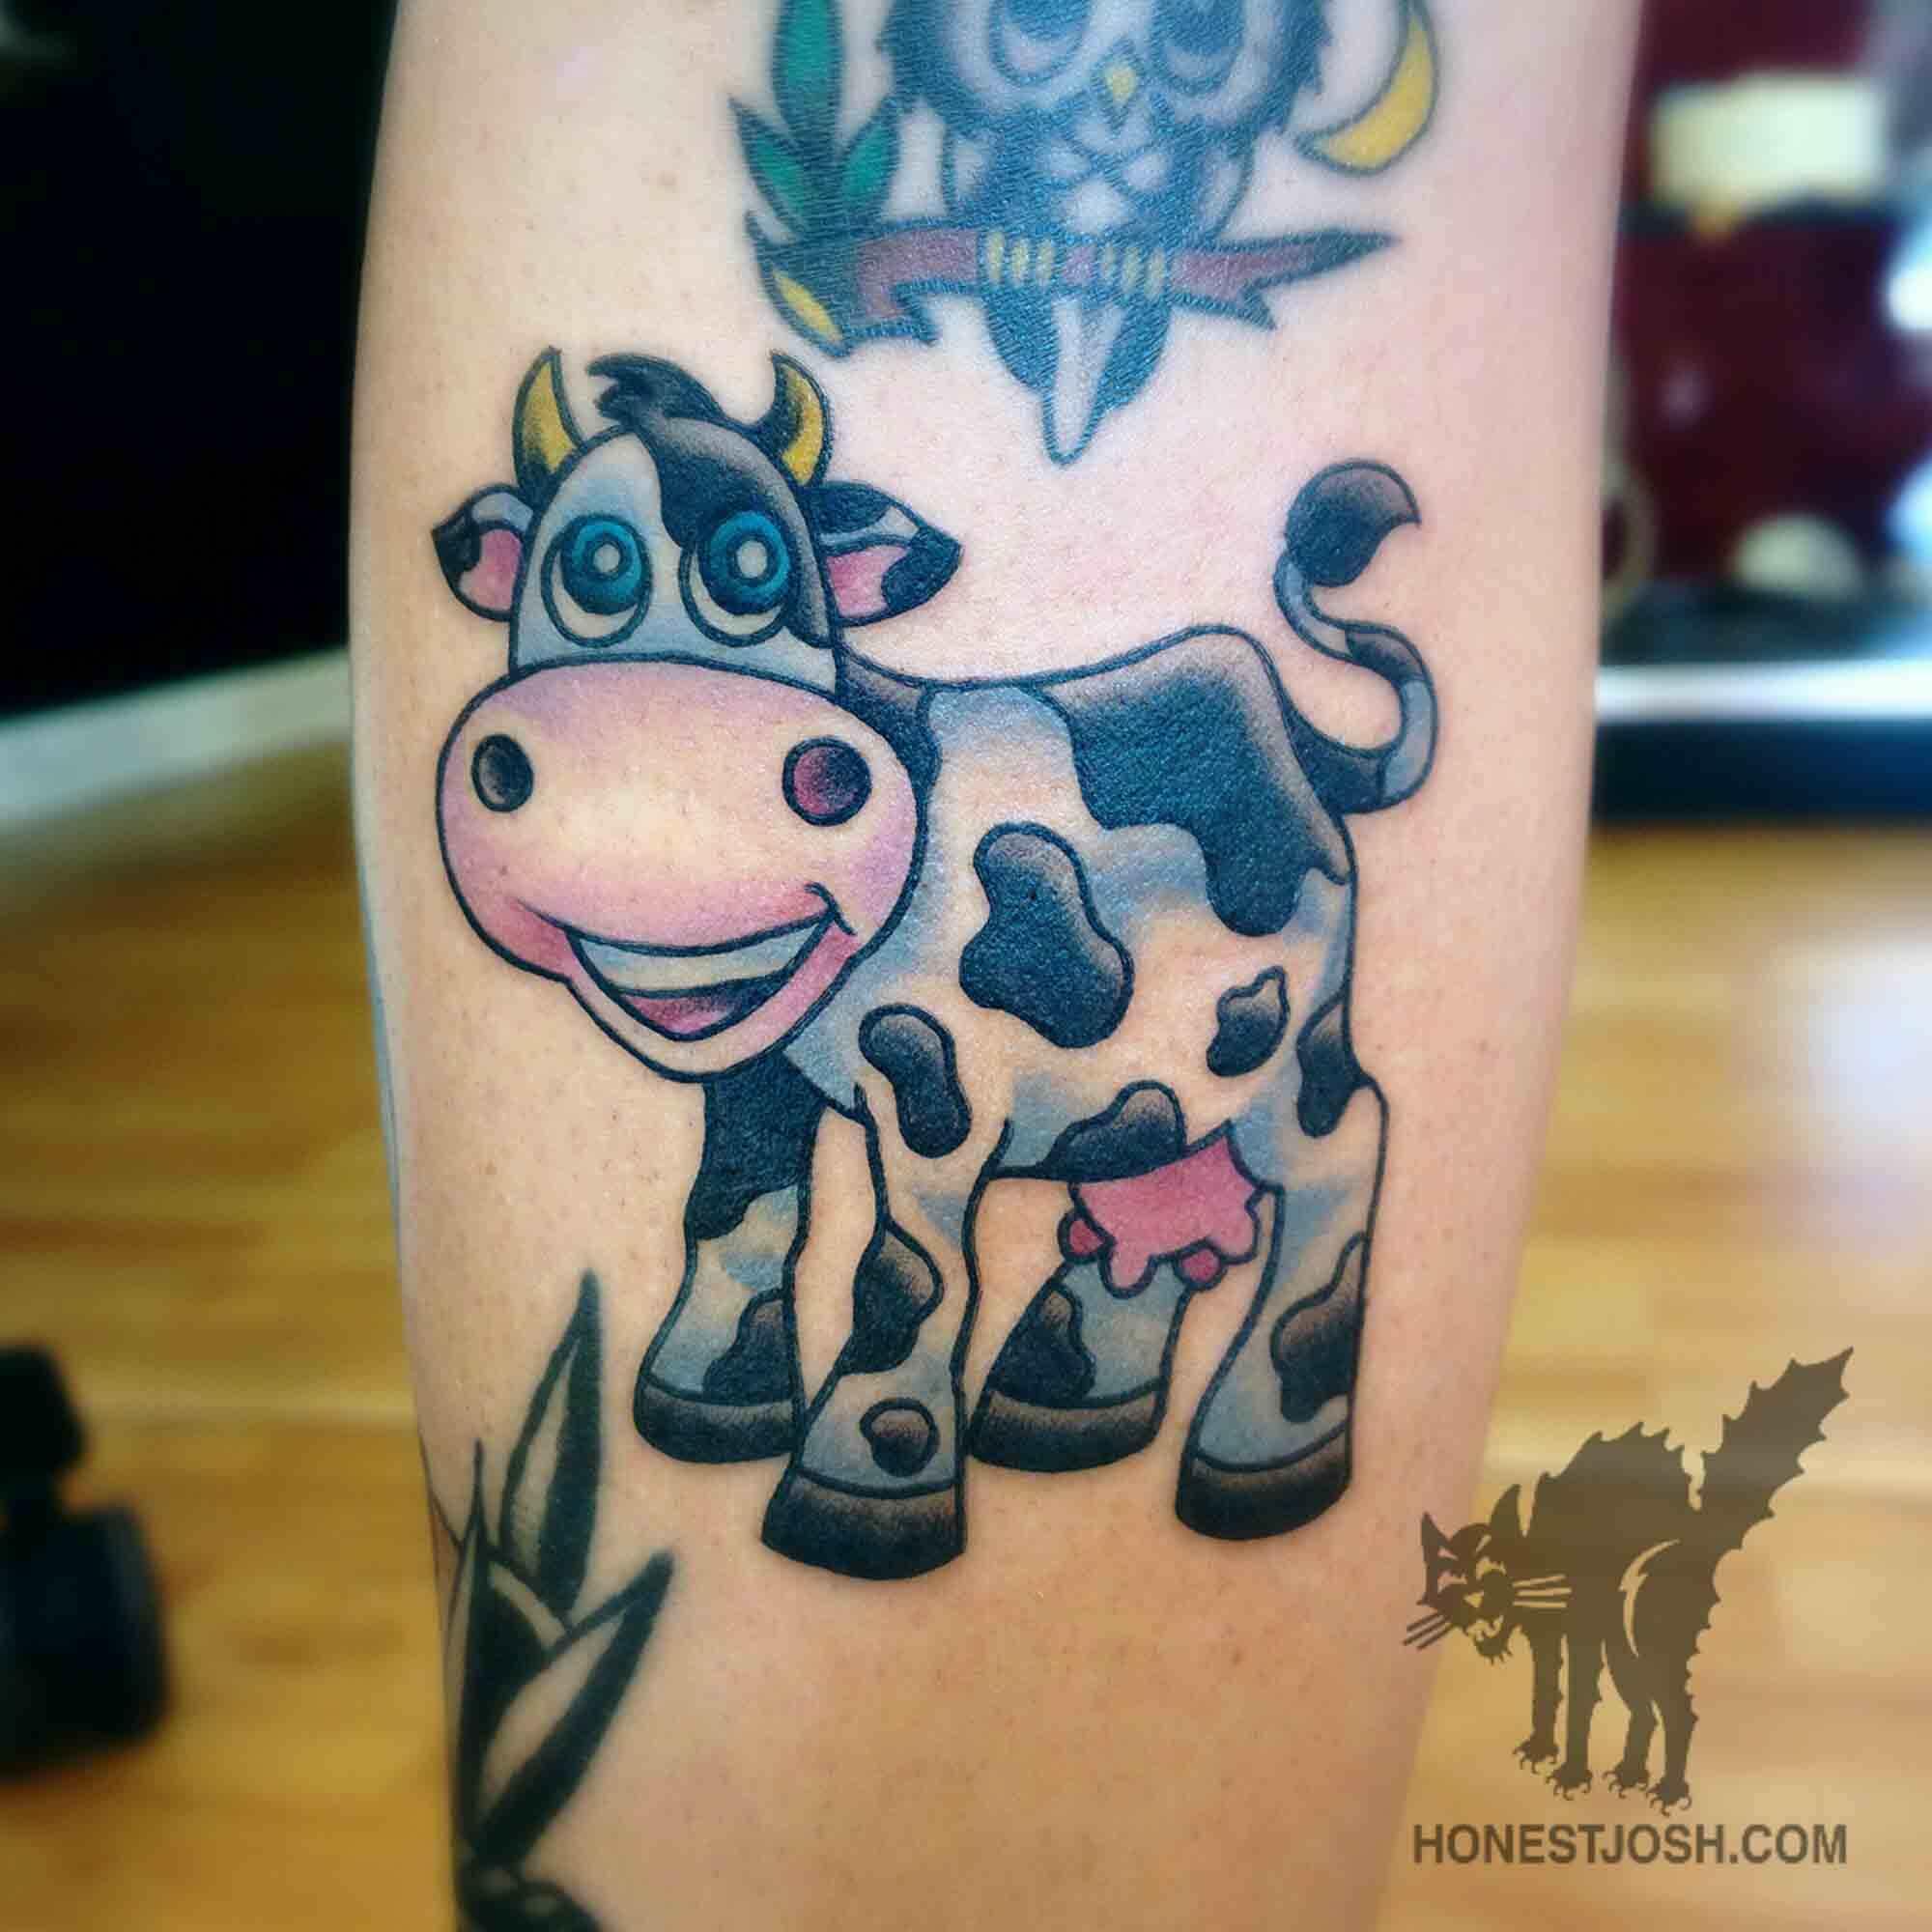 041a4c895 Cute Cow Tattoo Design For Arm